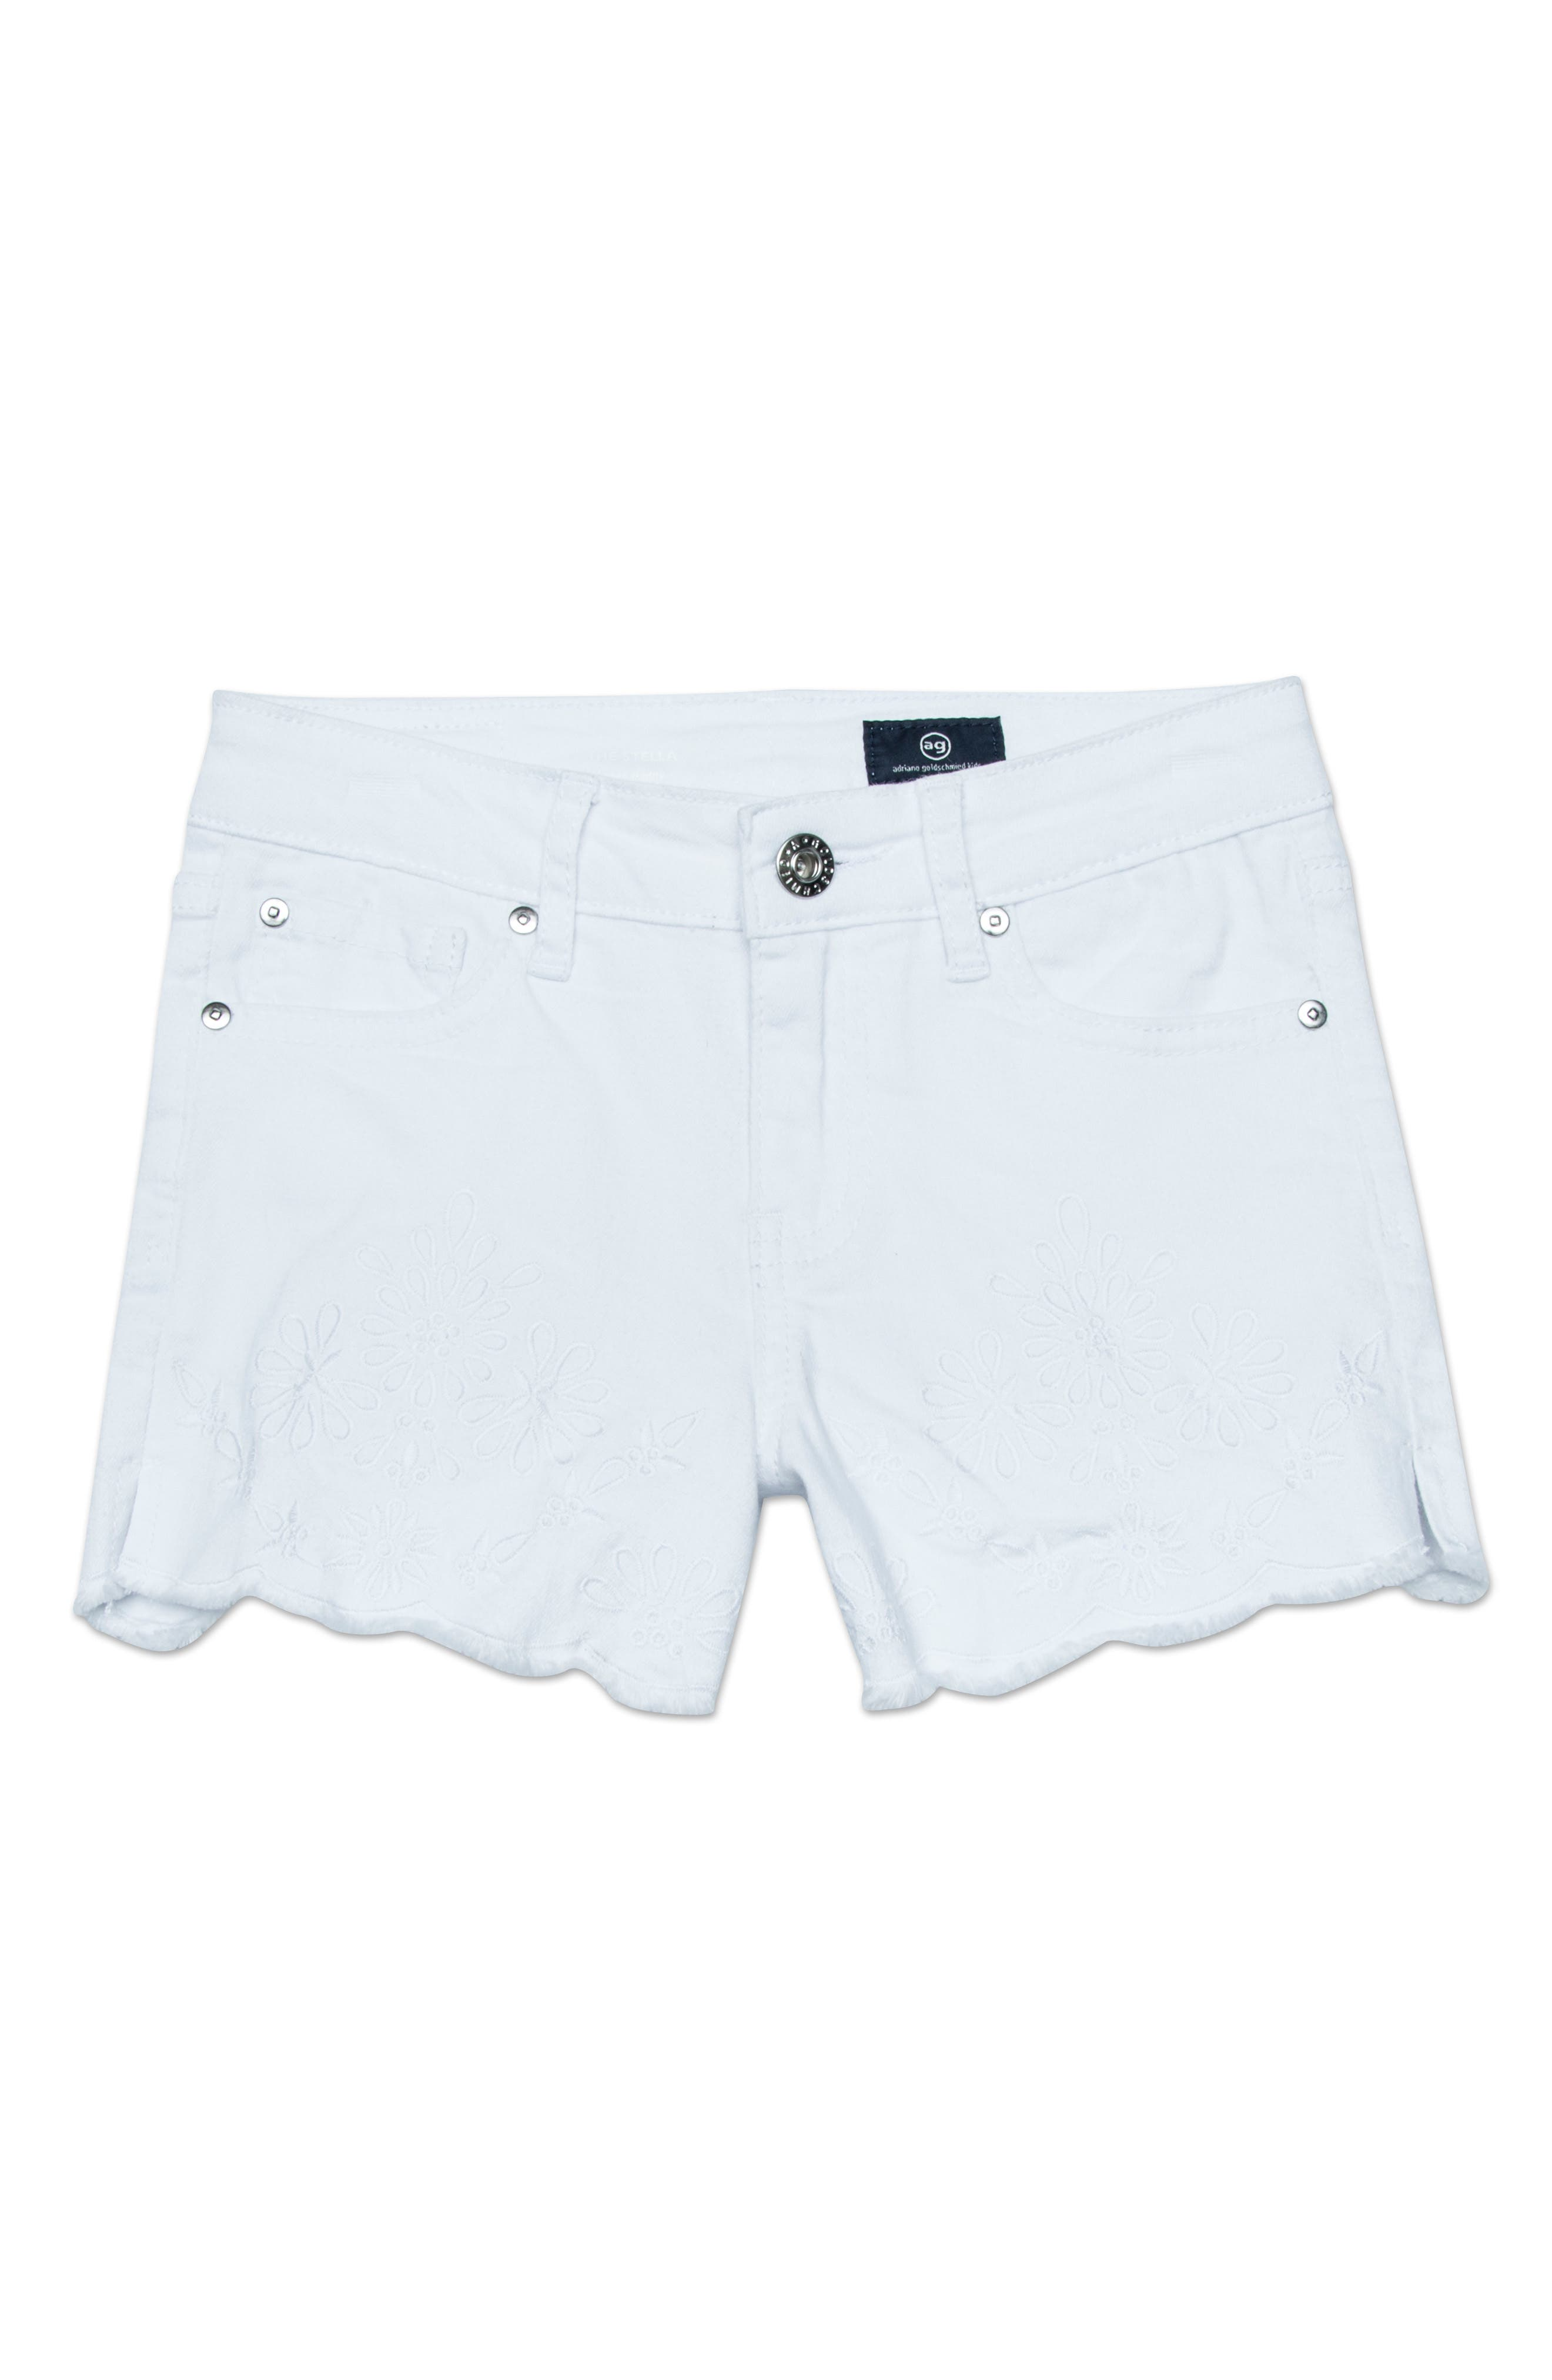 ag adriano goldschmeid kids The Brooklyn Scallop Denim Shorts,                         Main,                         color, WHITE/ COCONUT